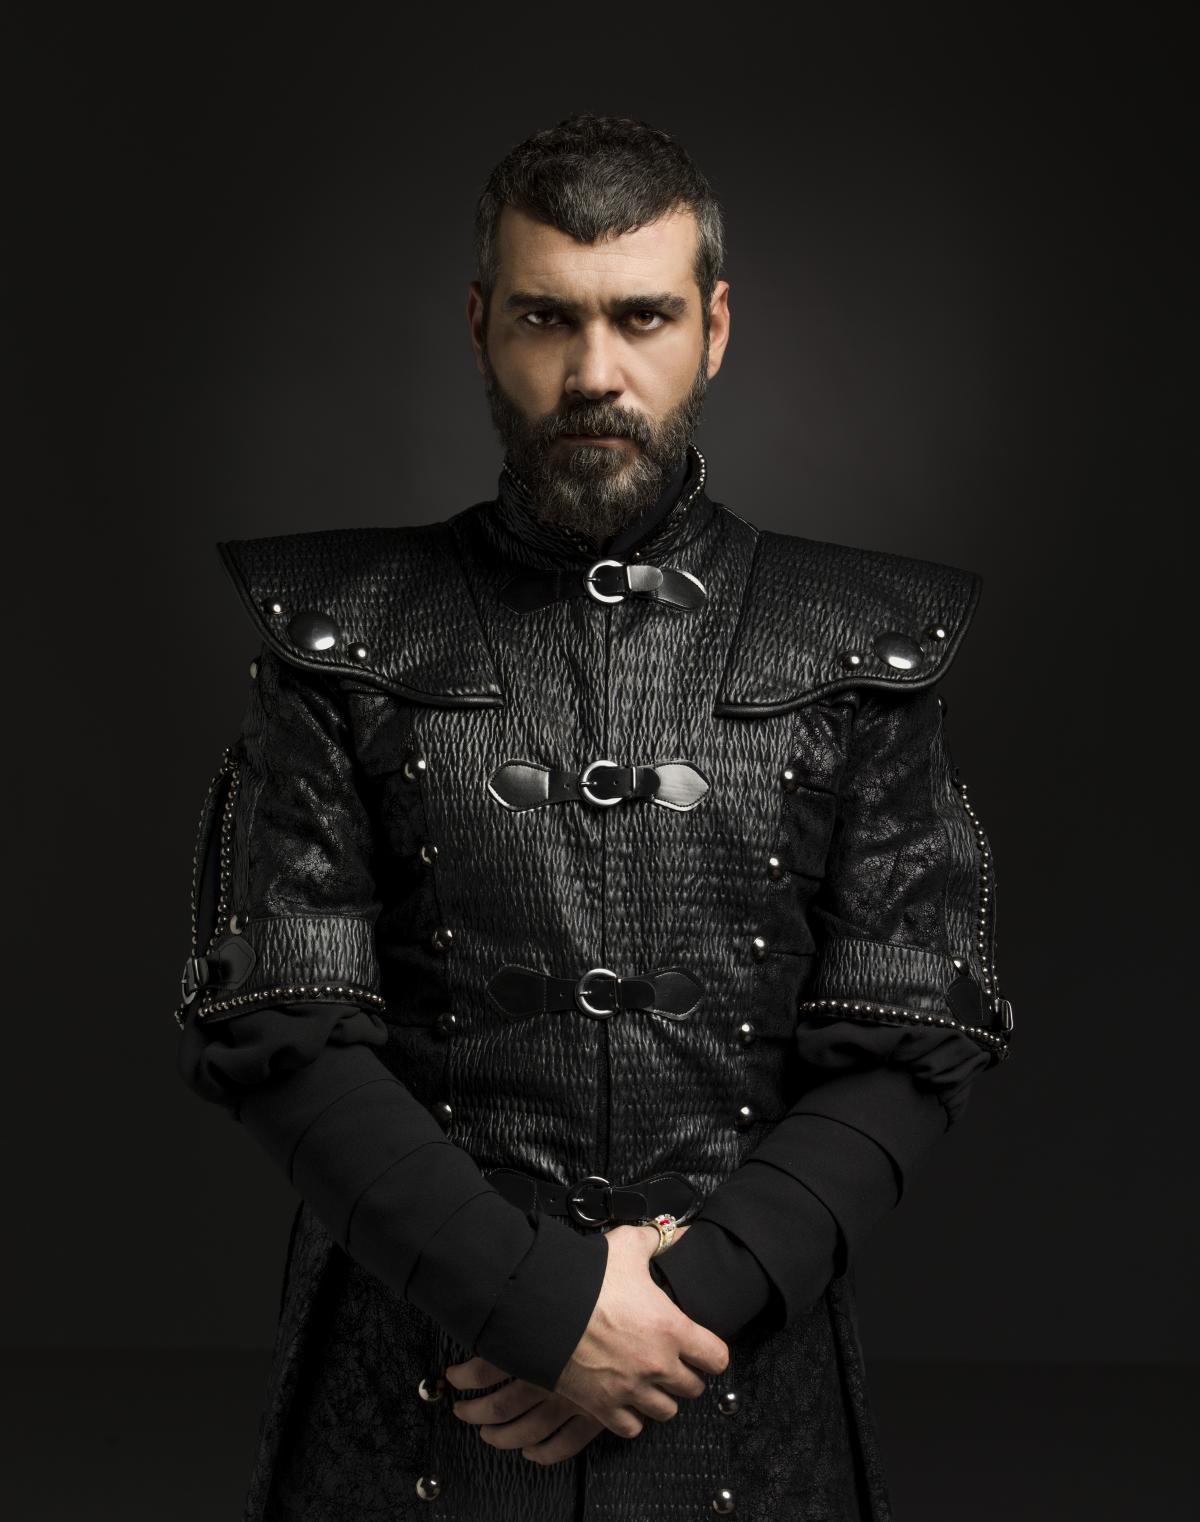 Silahtar Mustafa Paşa (ВЕЛИКОЛЕПНЫЙ ВЕК. КЁСЕМ - 2 СЕЗОН).jpg